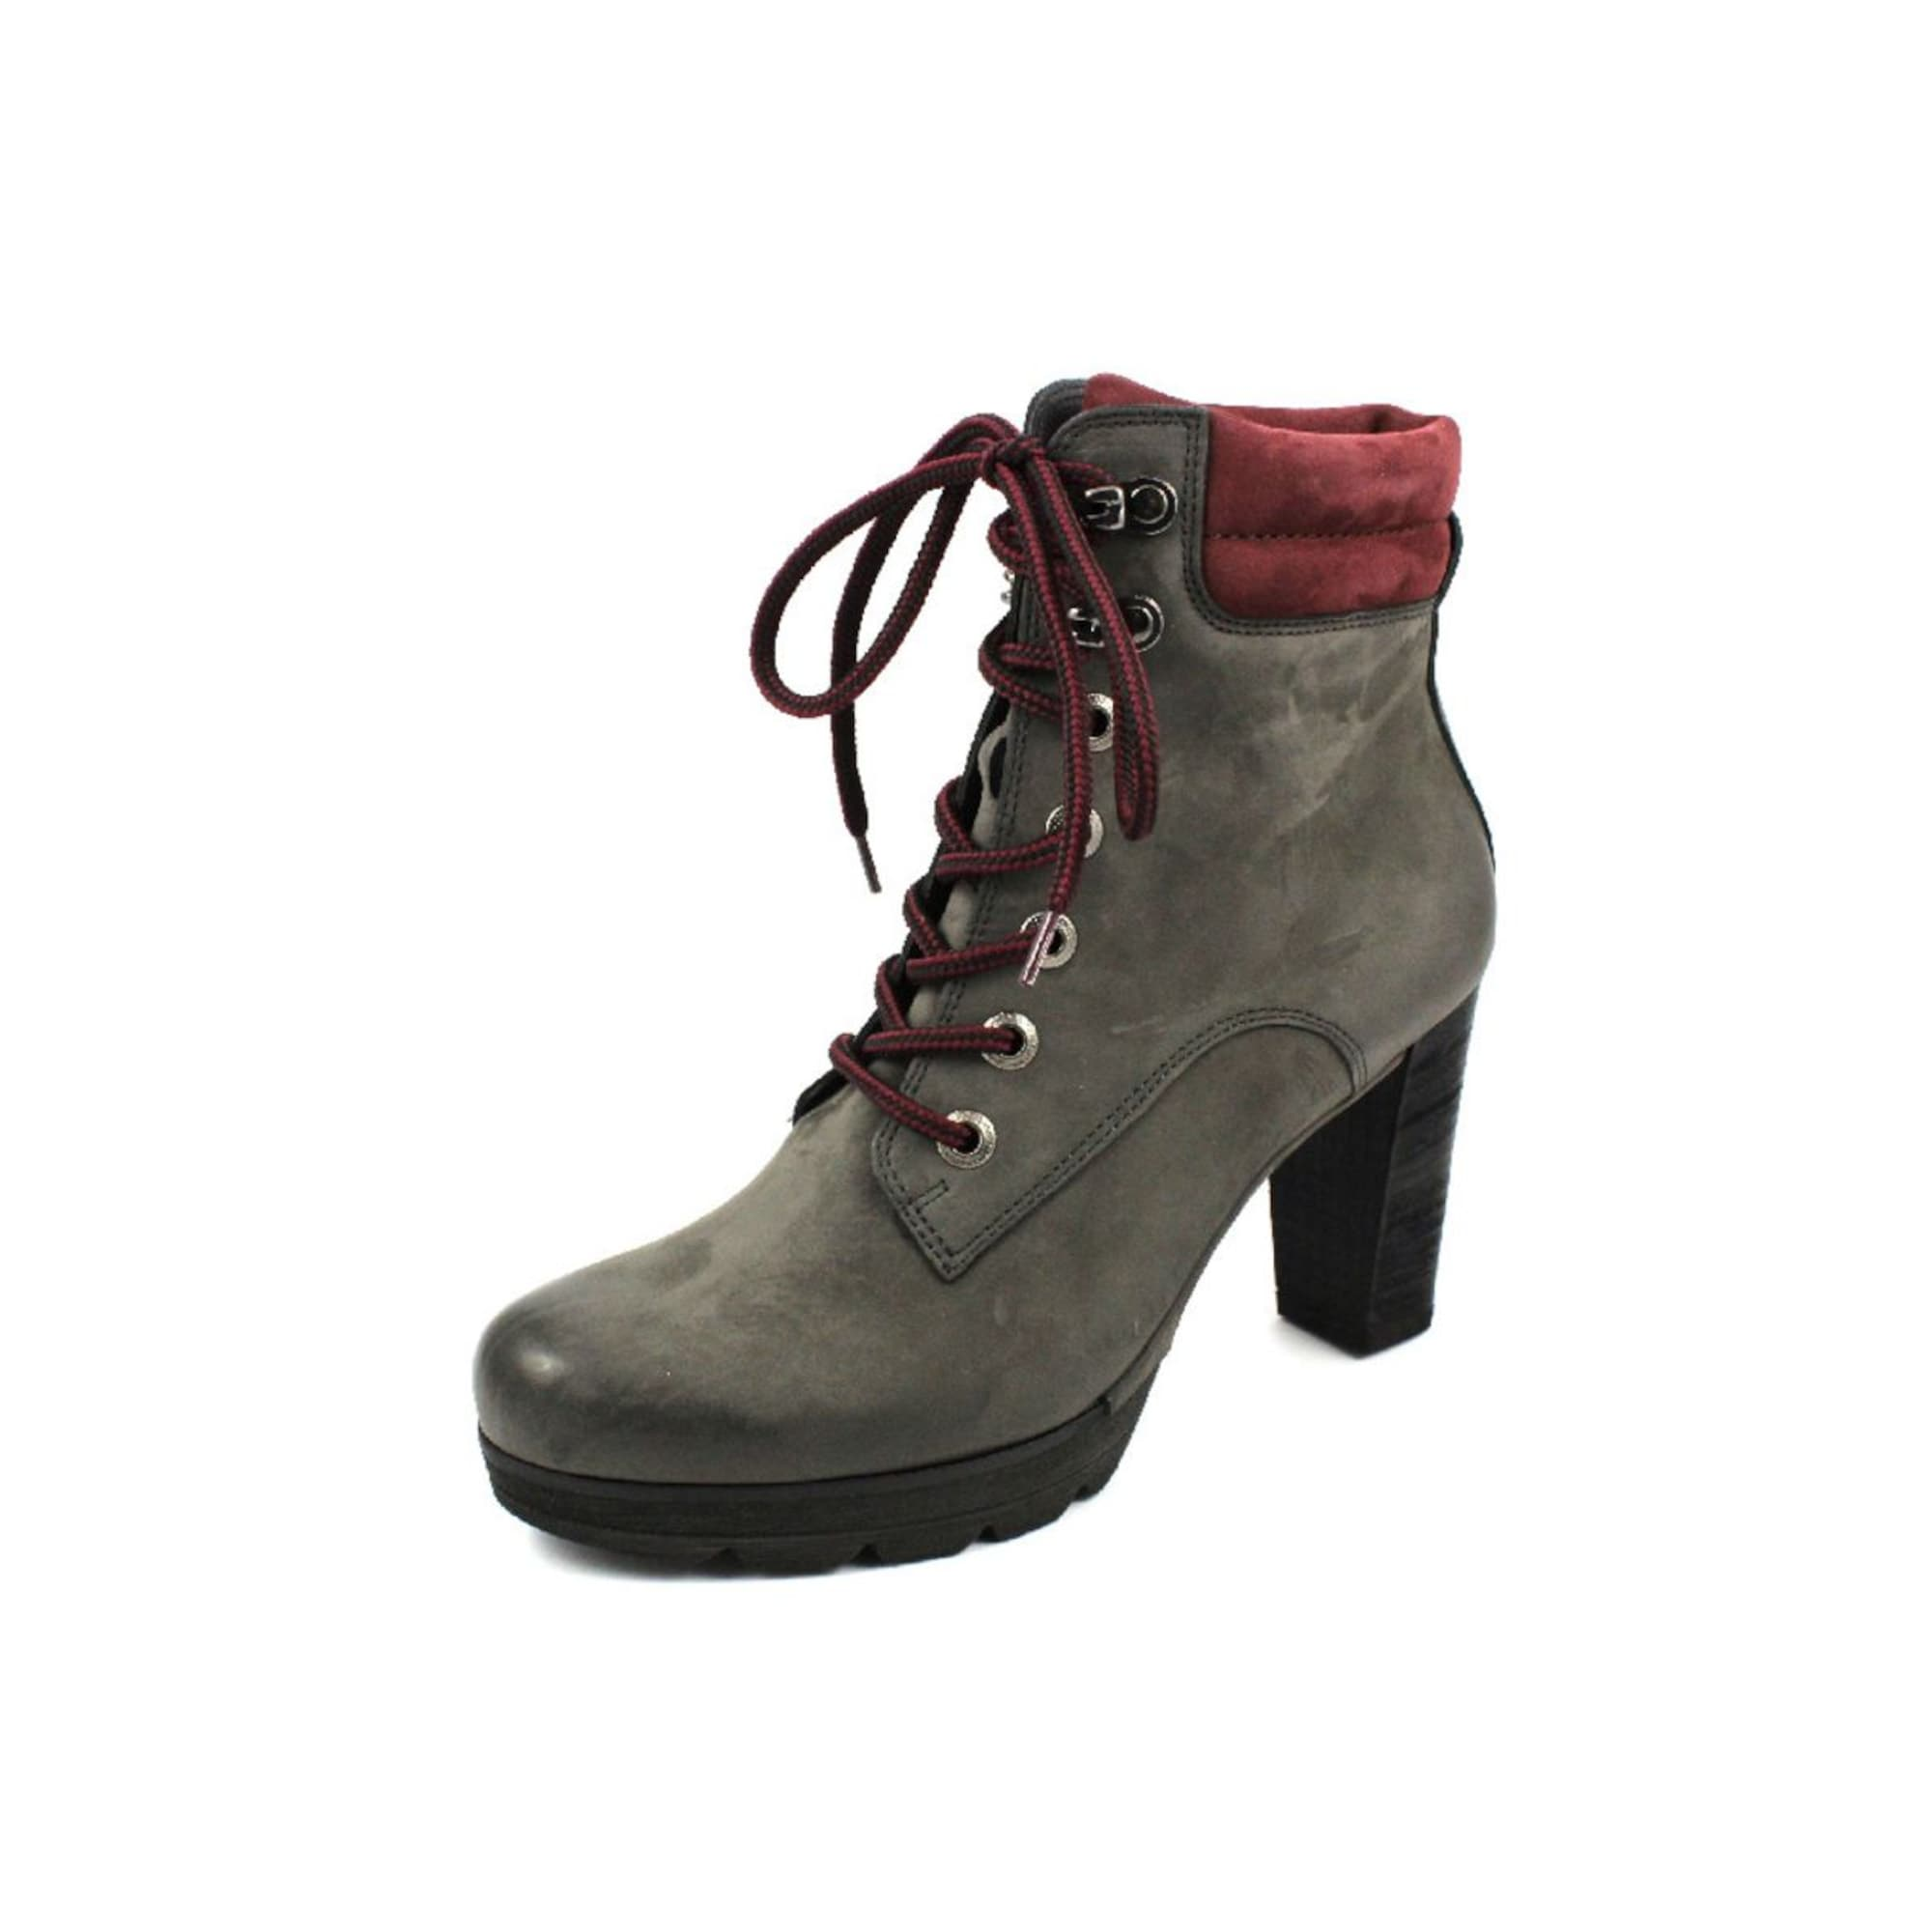 Stiefel | Schuhe > Stiefel > Sonstige Stiefel | Paul Green